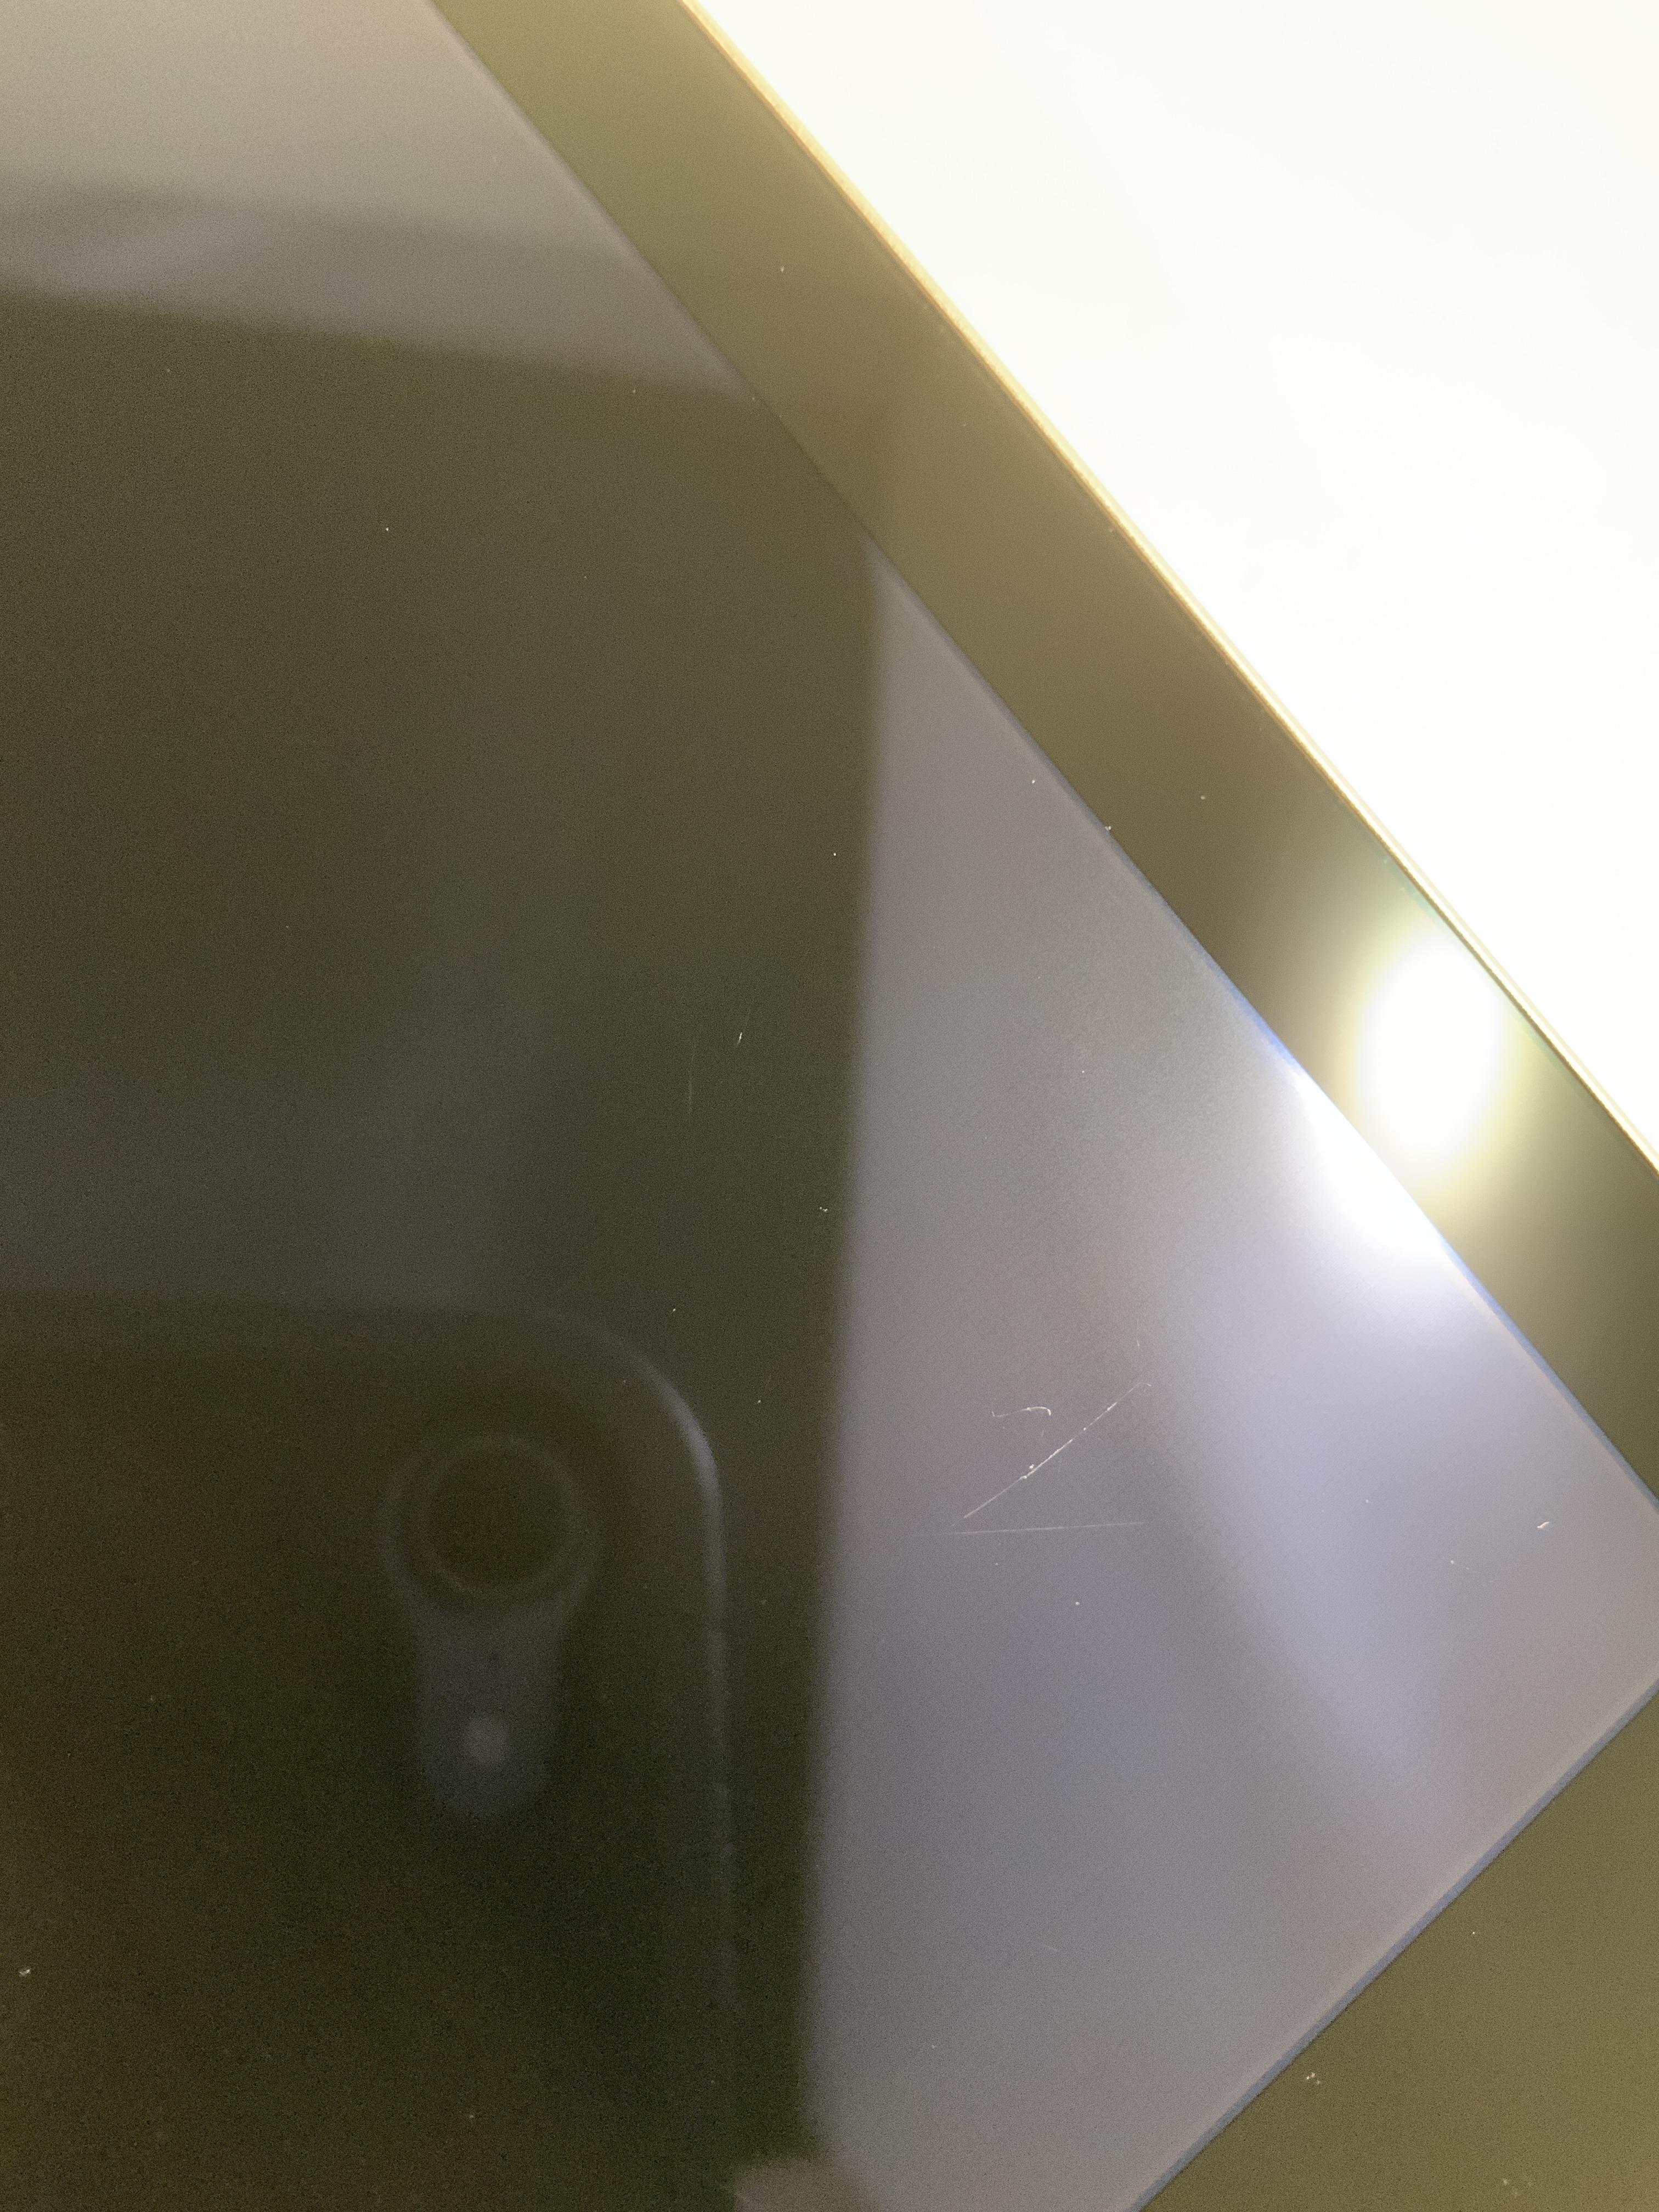 iPad Air 2 Wi-Fi + Cellular 64GB, 64GB, Space Gray, Afbeelding 3